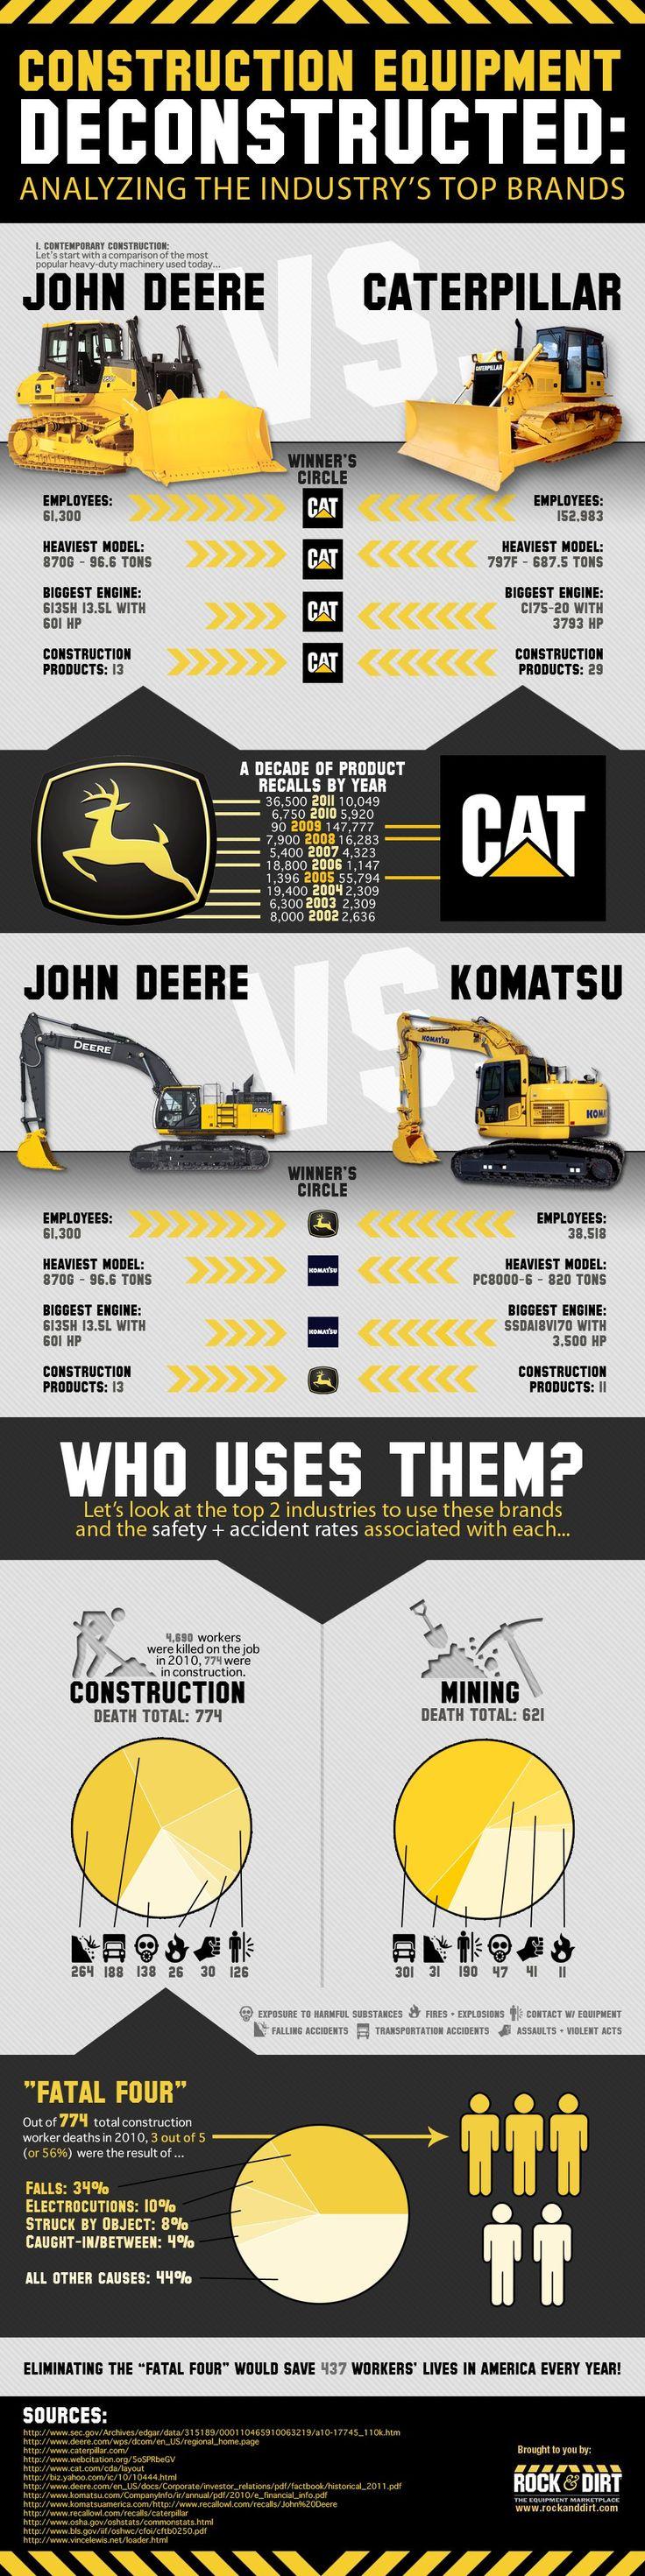 Battle of the Brands http://blog.rockanddirt.com/community/general-articles/construction-equipment-deconstructed/#